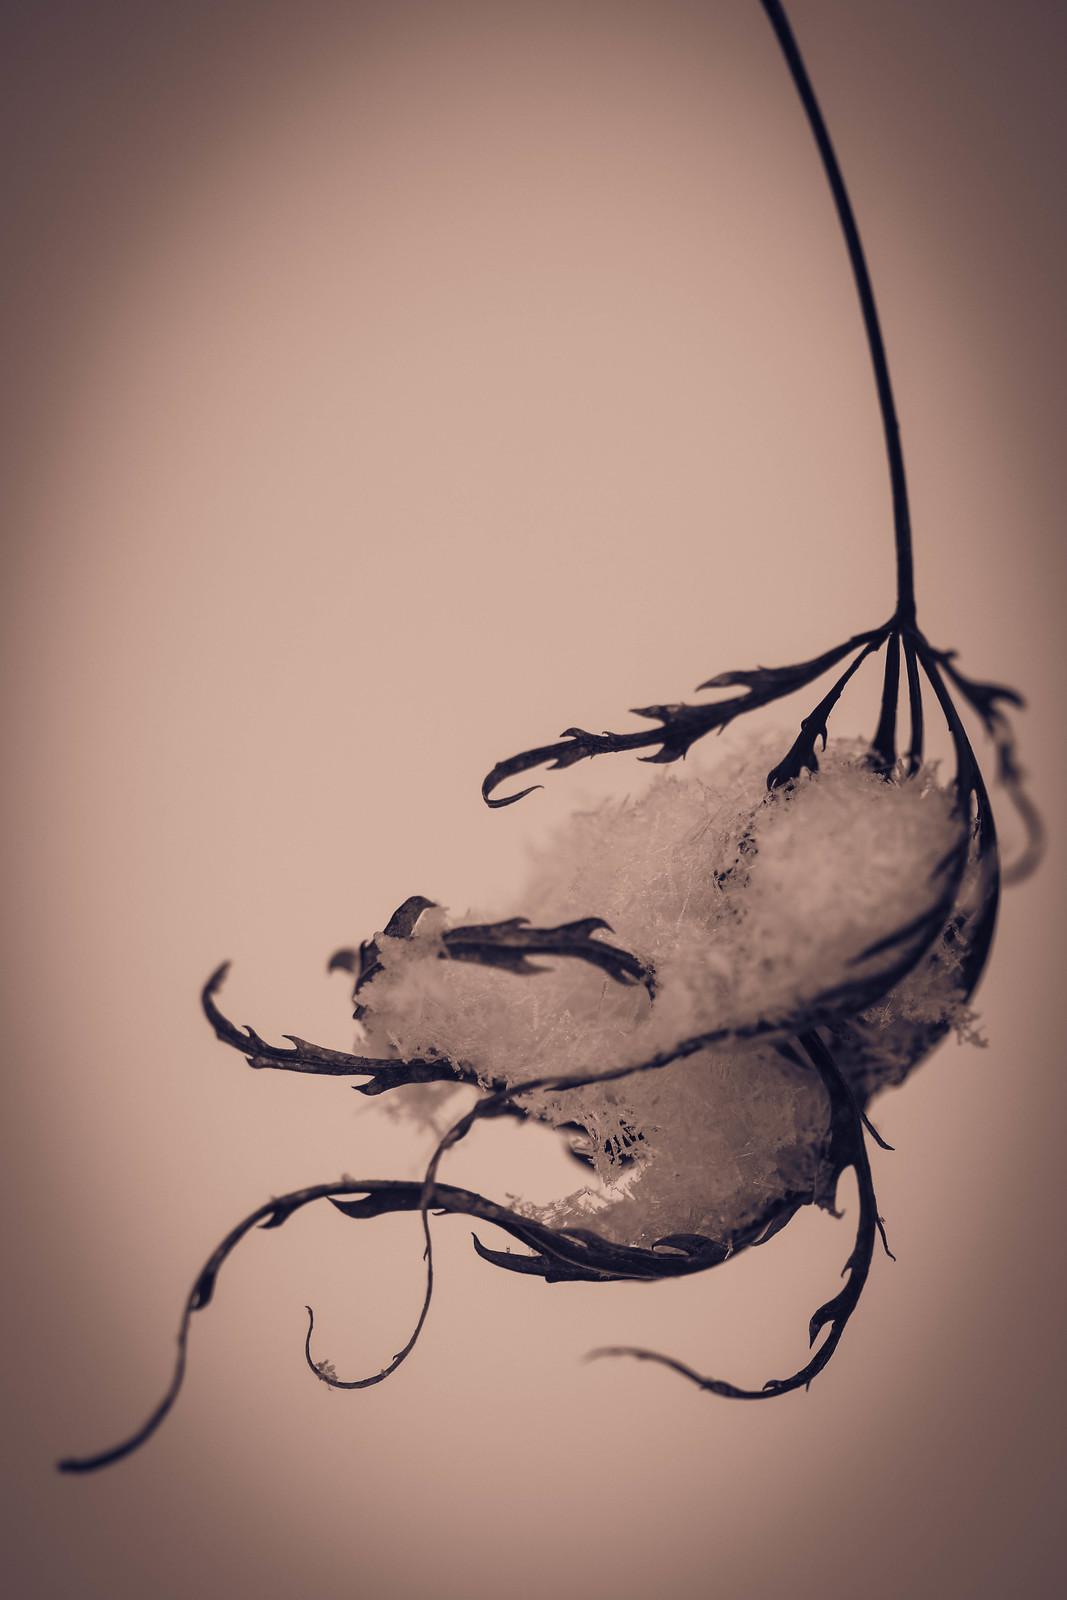 Macro Monday: The Cradling Hand